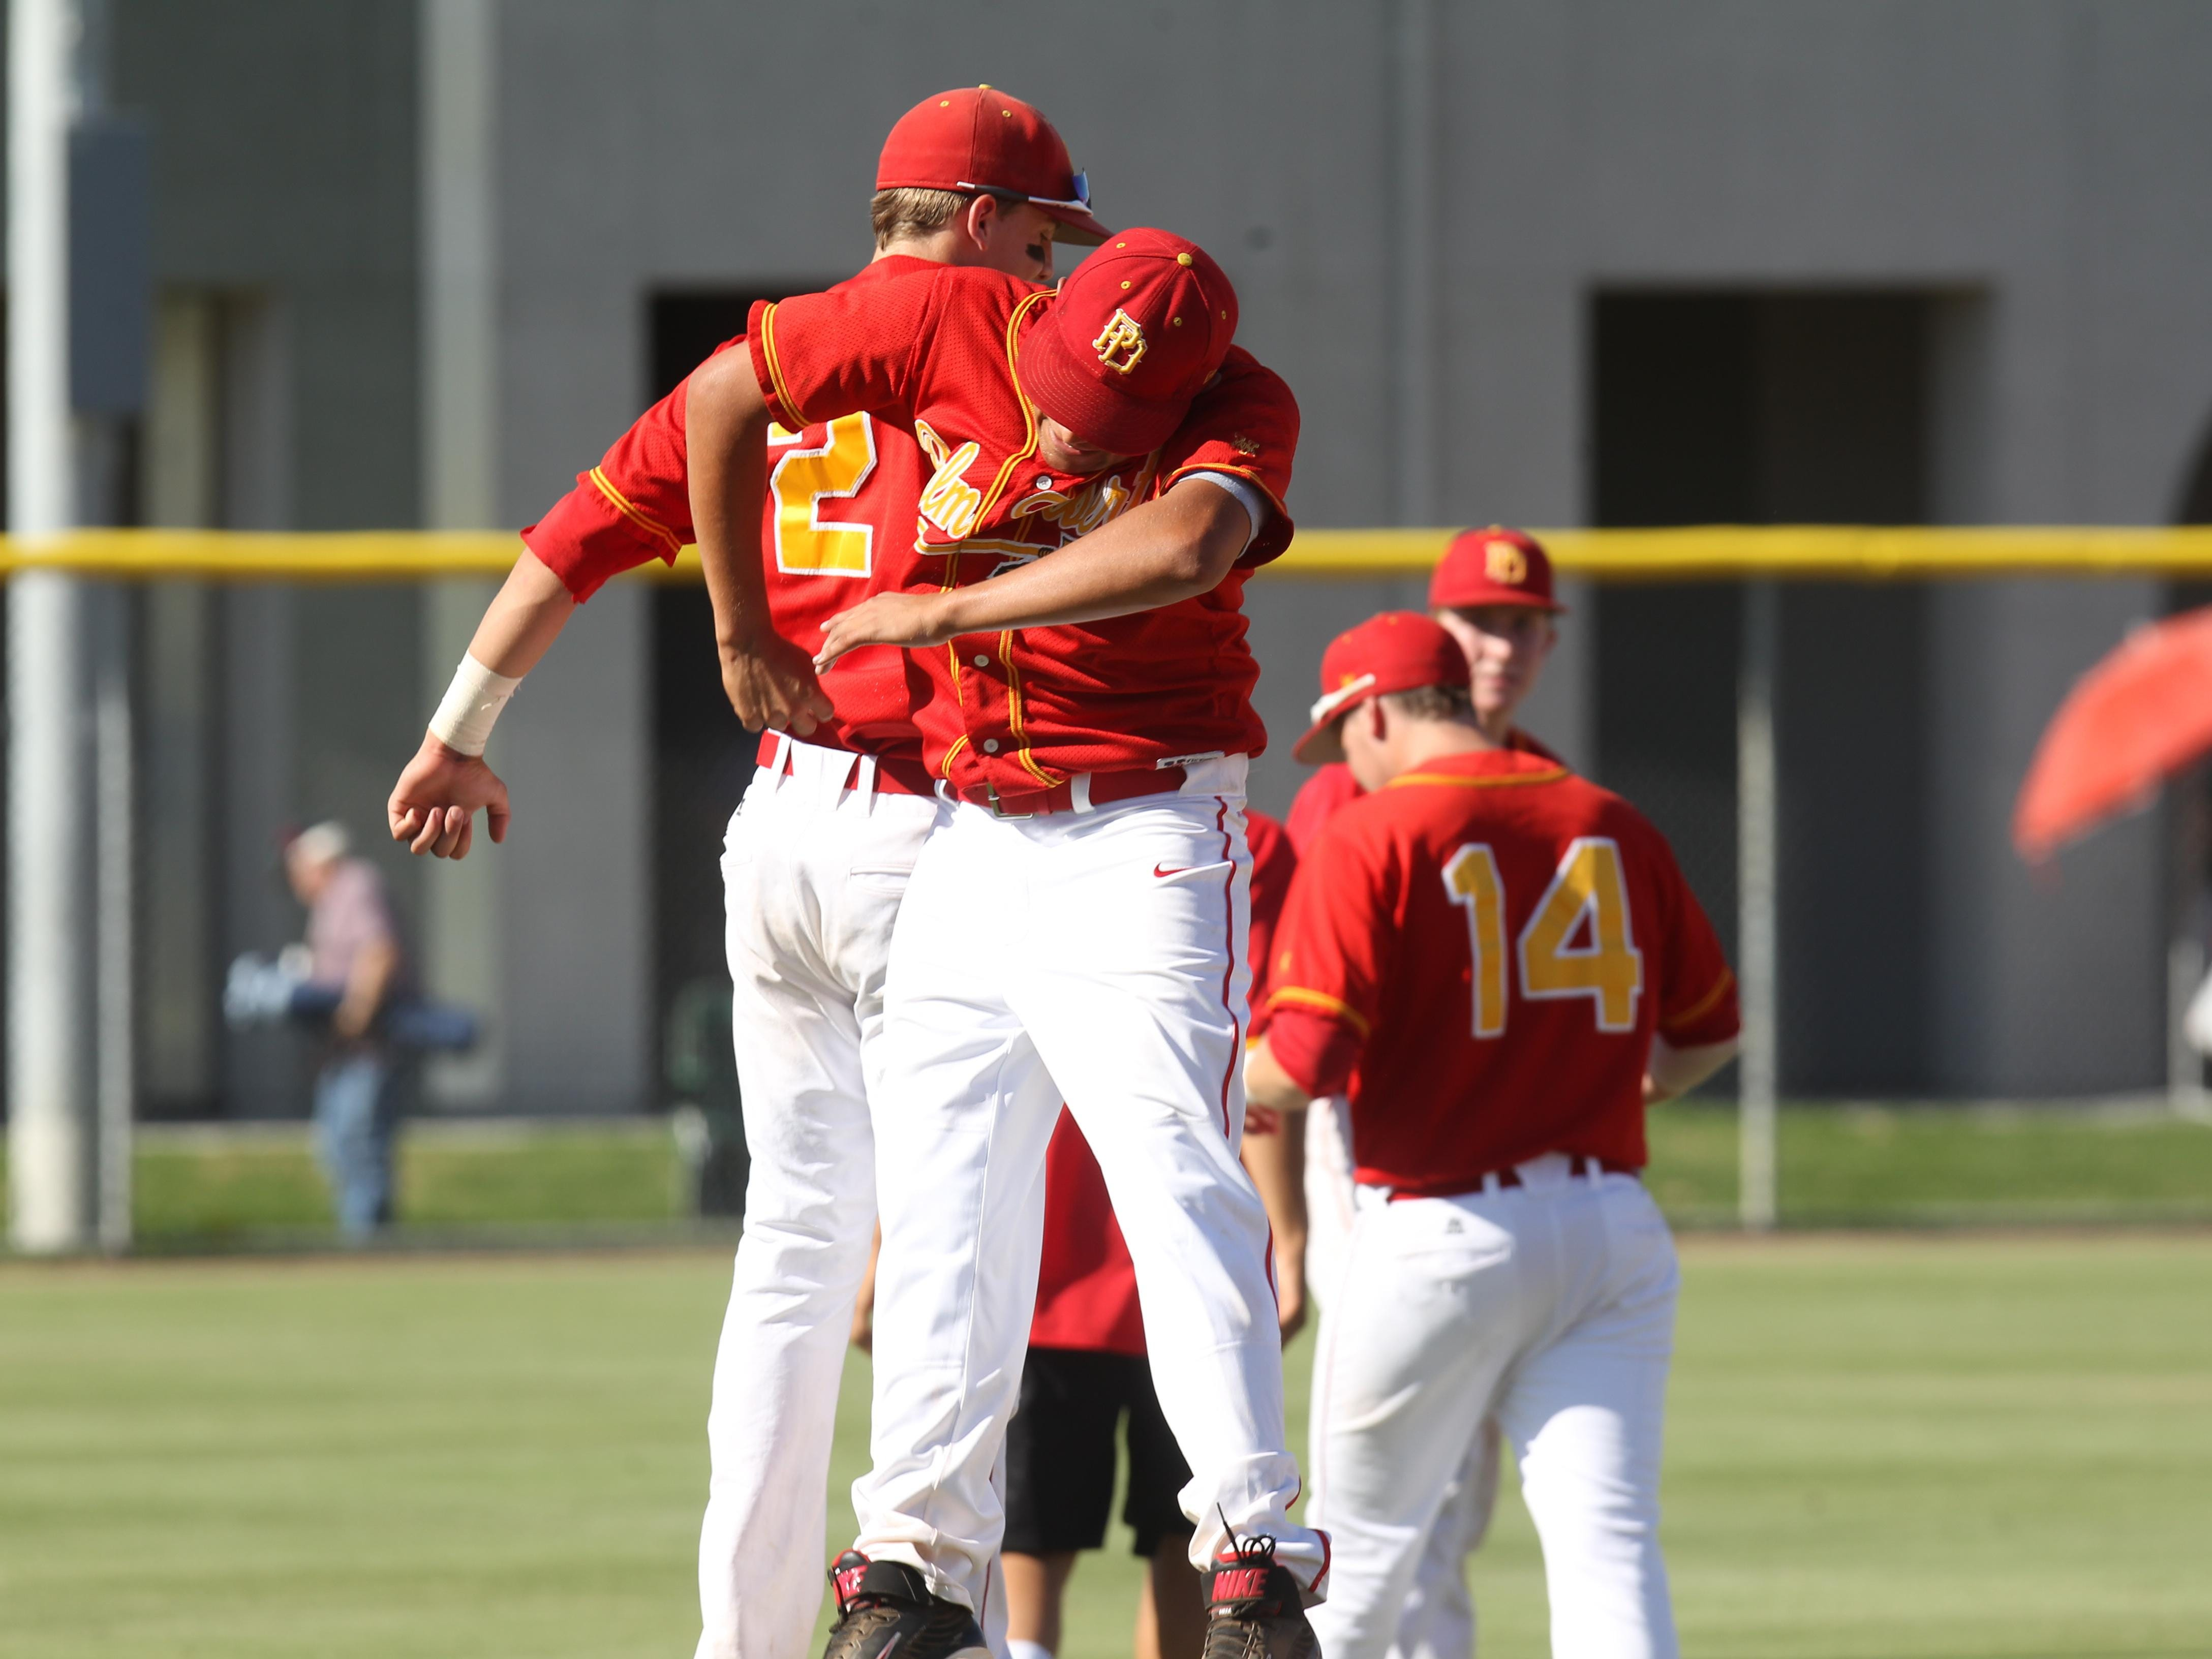 Palm Desert's (from left) Travis Moniot and Josh Burke celebrate a CIF win against Santa Monica at Palm Desert High School June 3, 2014.